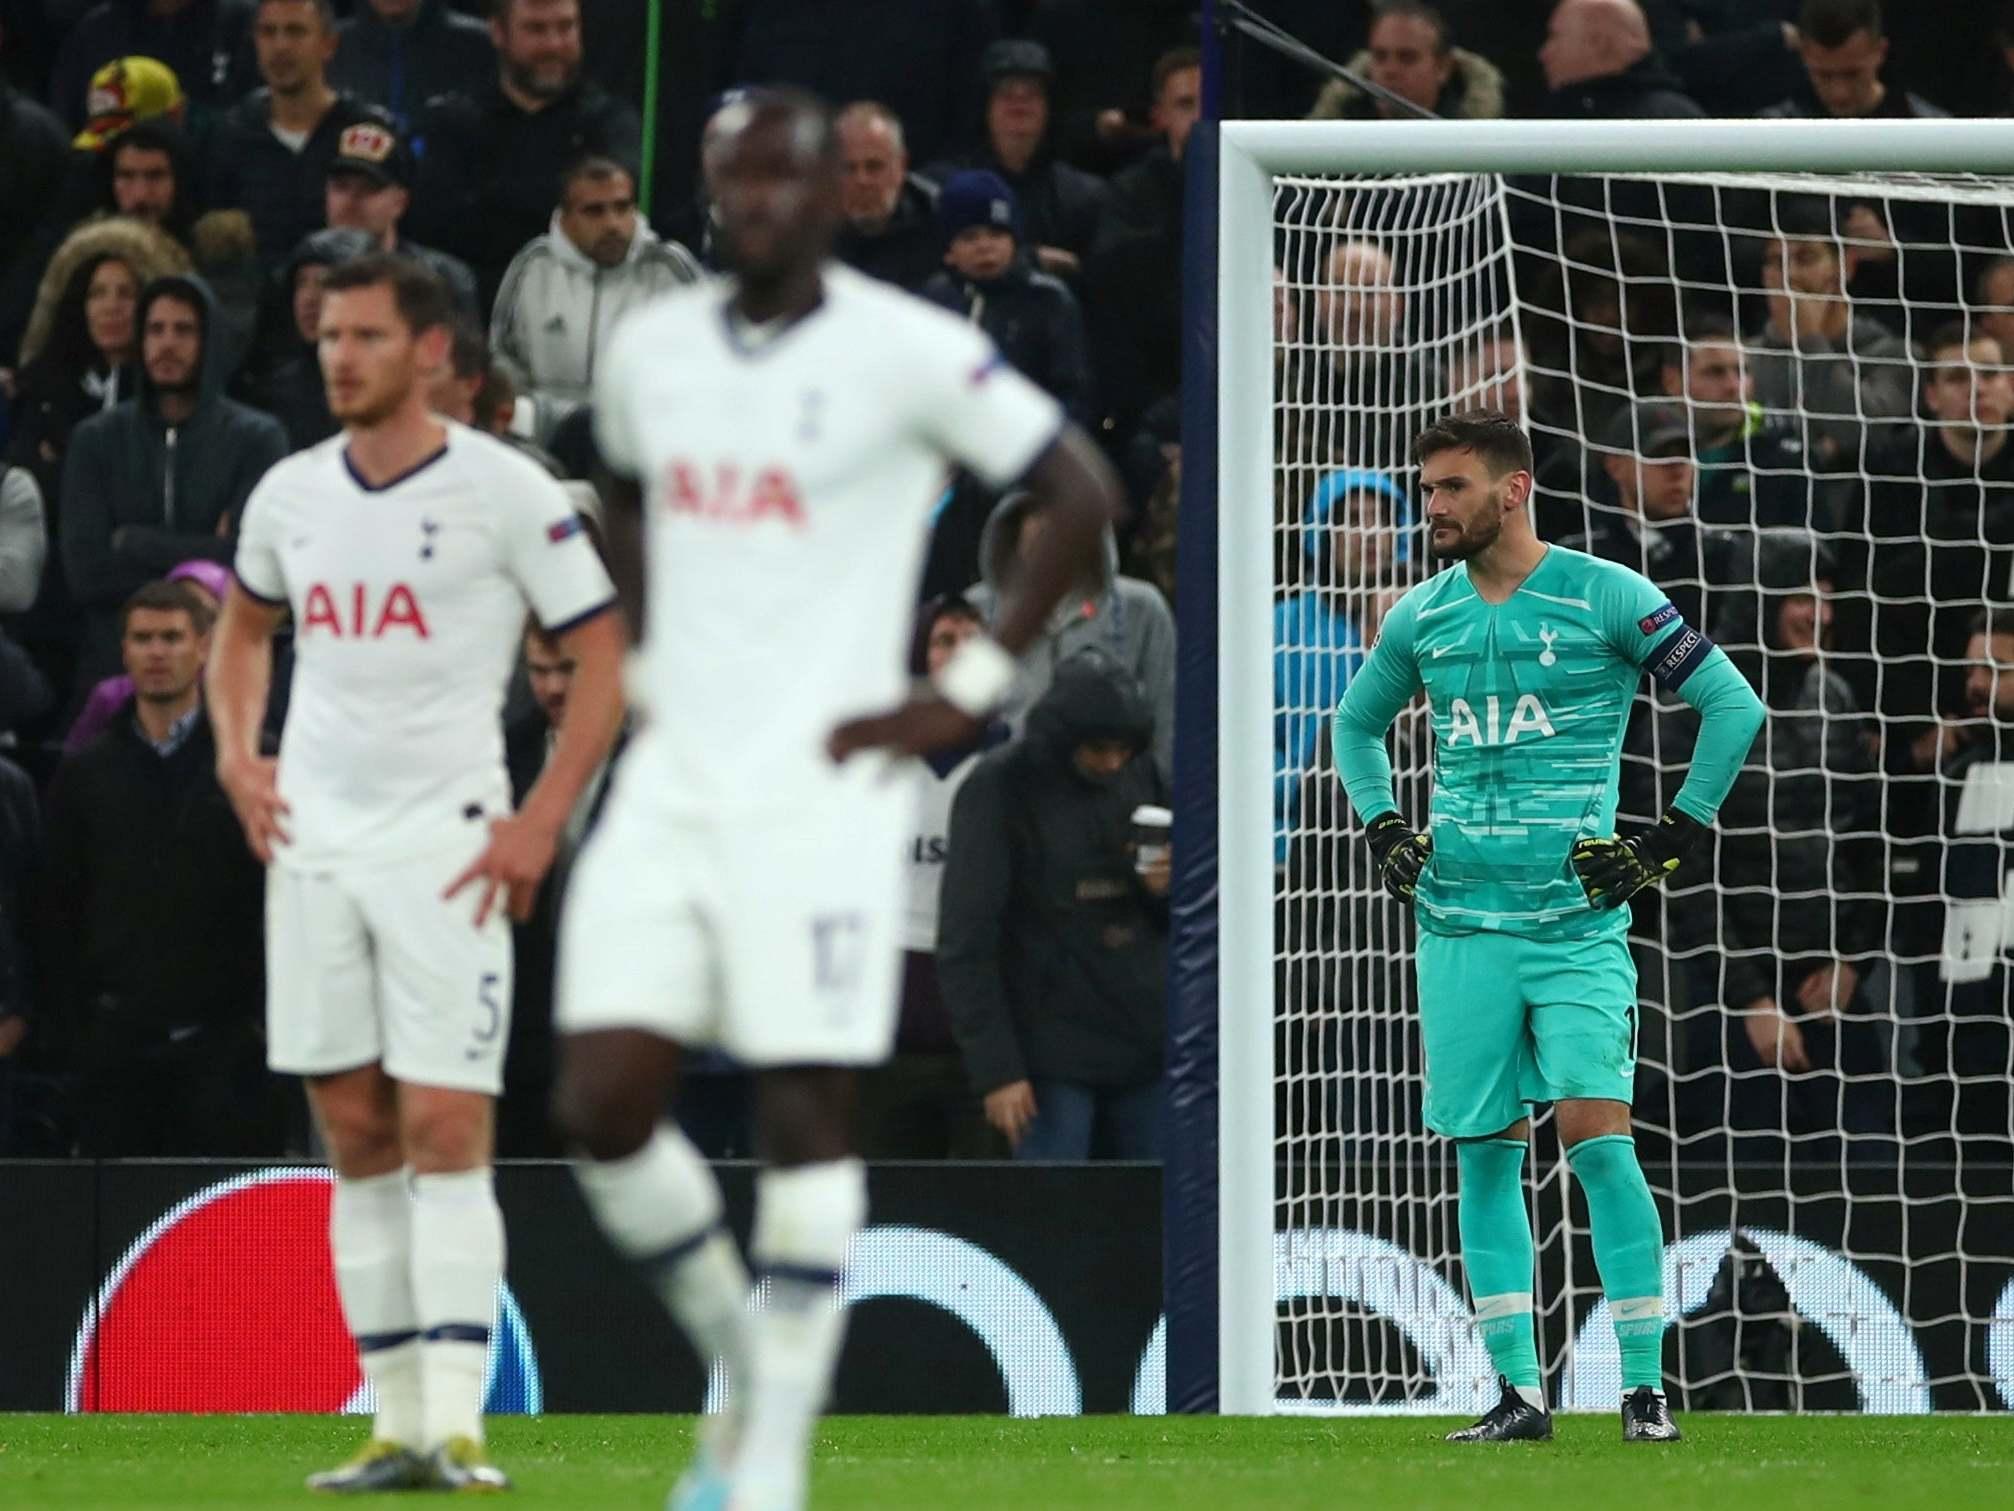 Tottenham vs Bayern Munich: Hugo Lloris admits Spurs 'gave up' in humiliating Champions League loss